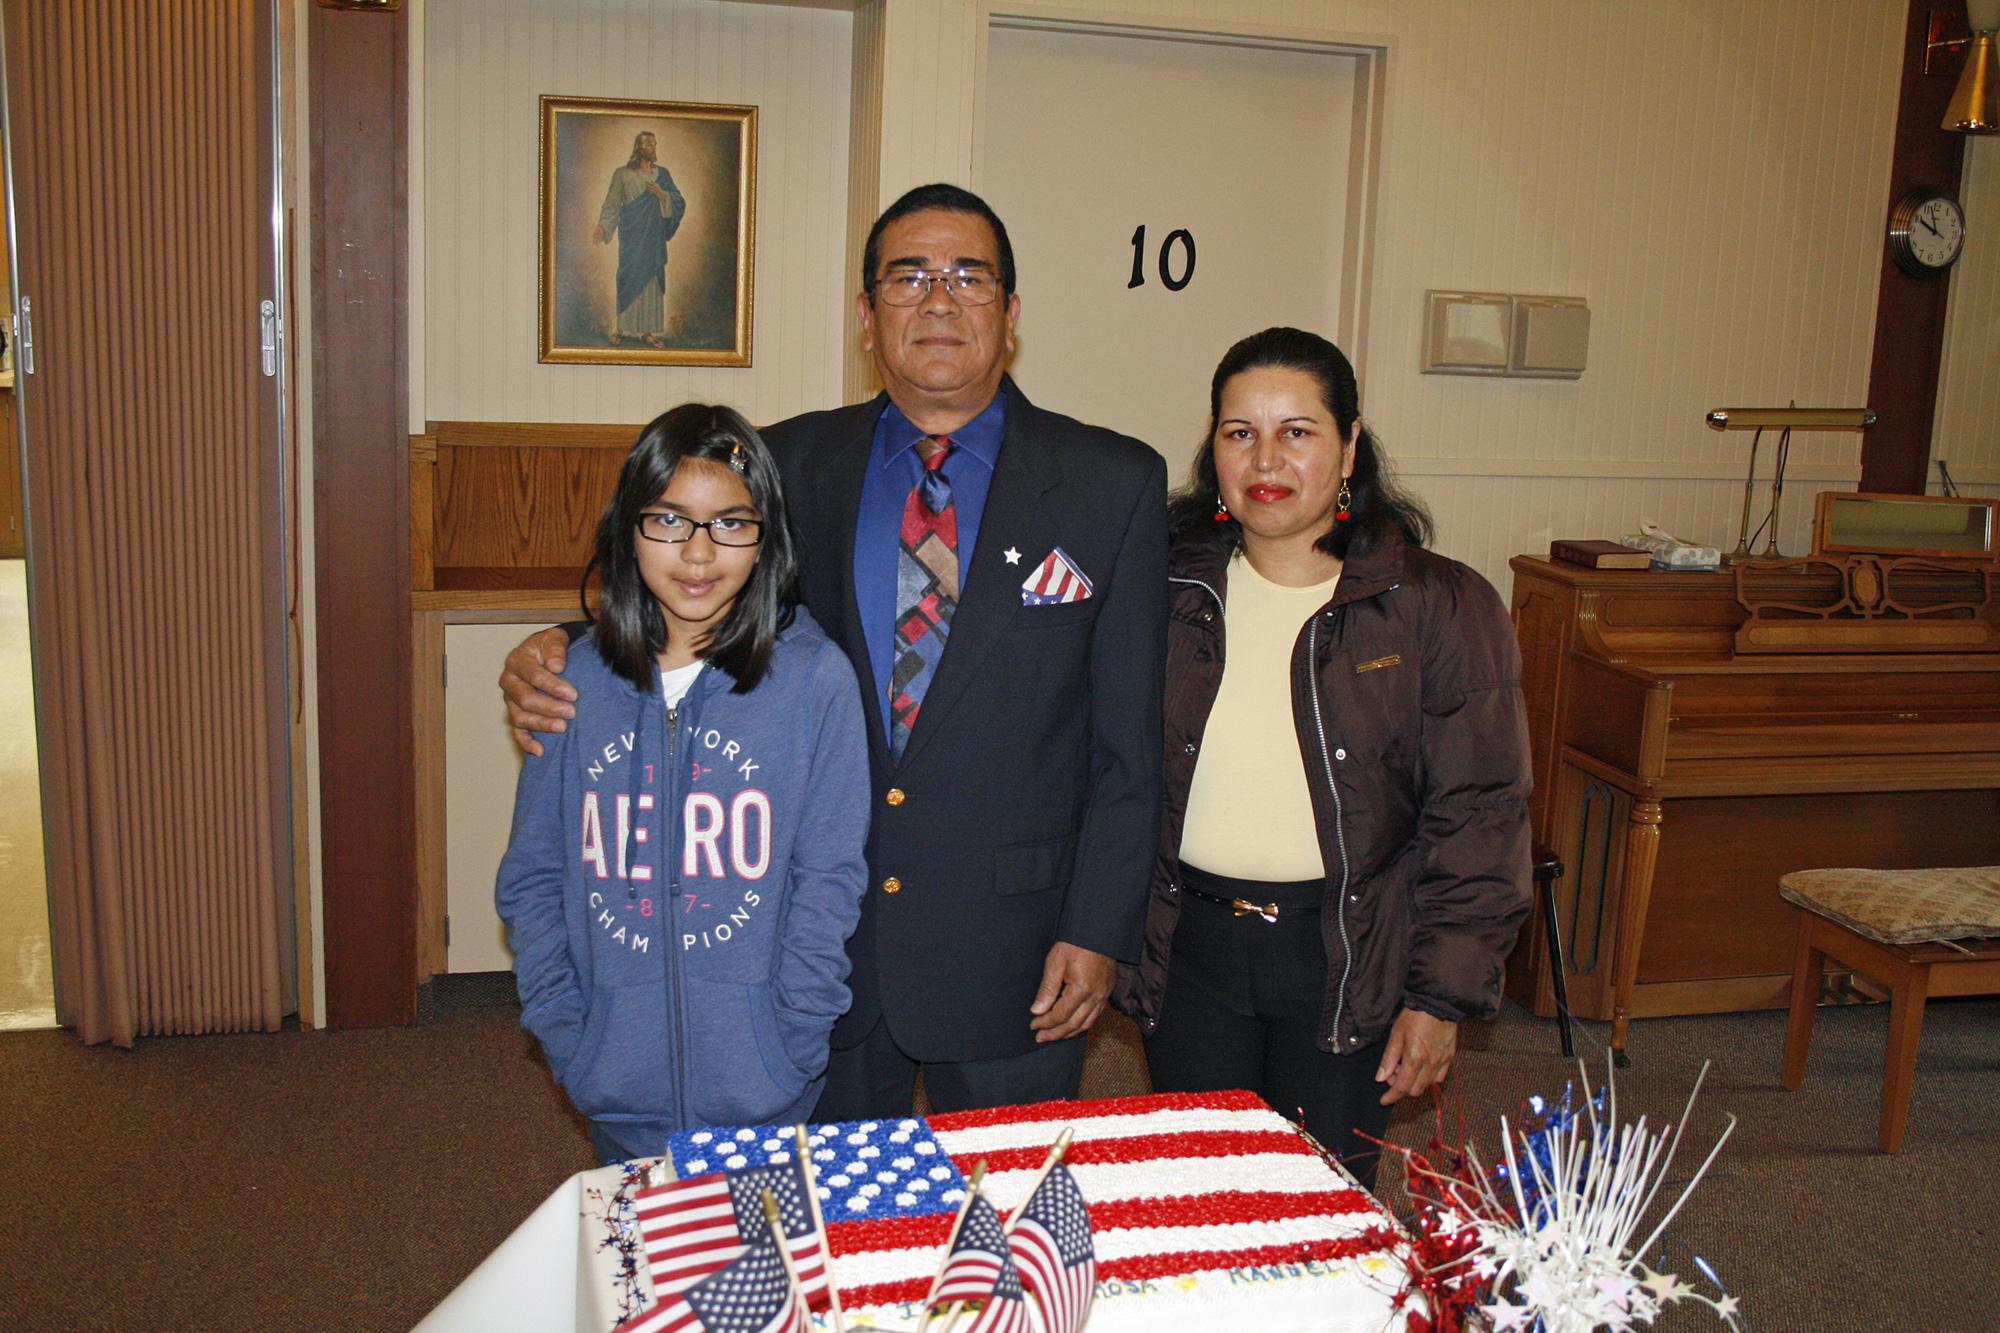 Celebrating citizenship